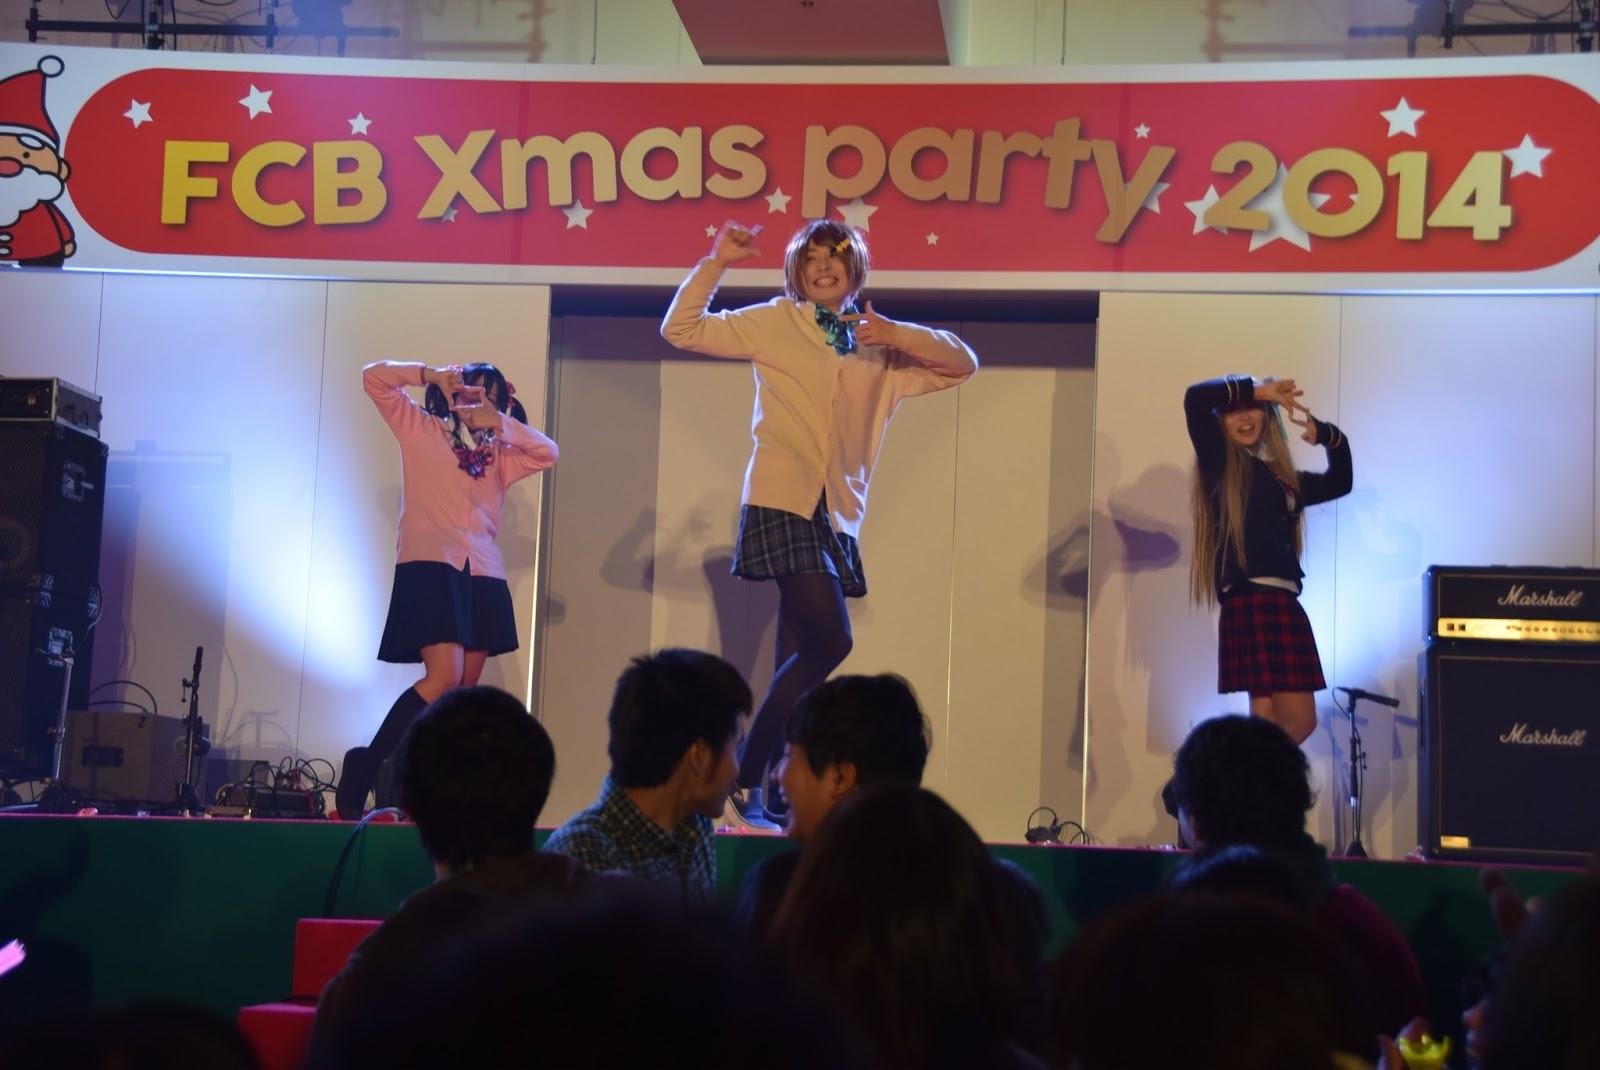 http://fcb-ac-jp.blogspot.jp/2014/12/blog-post_28.html